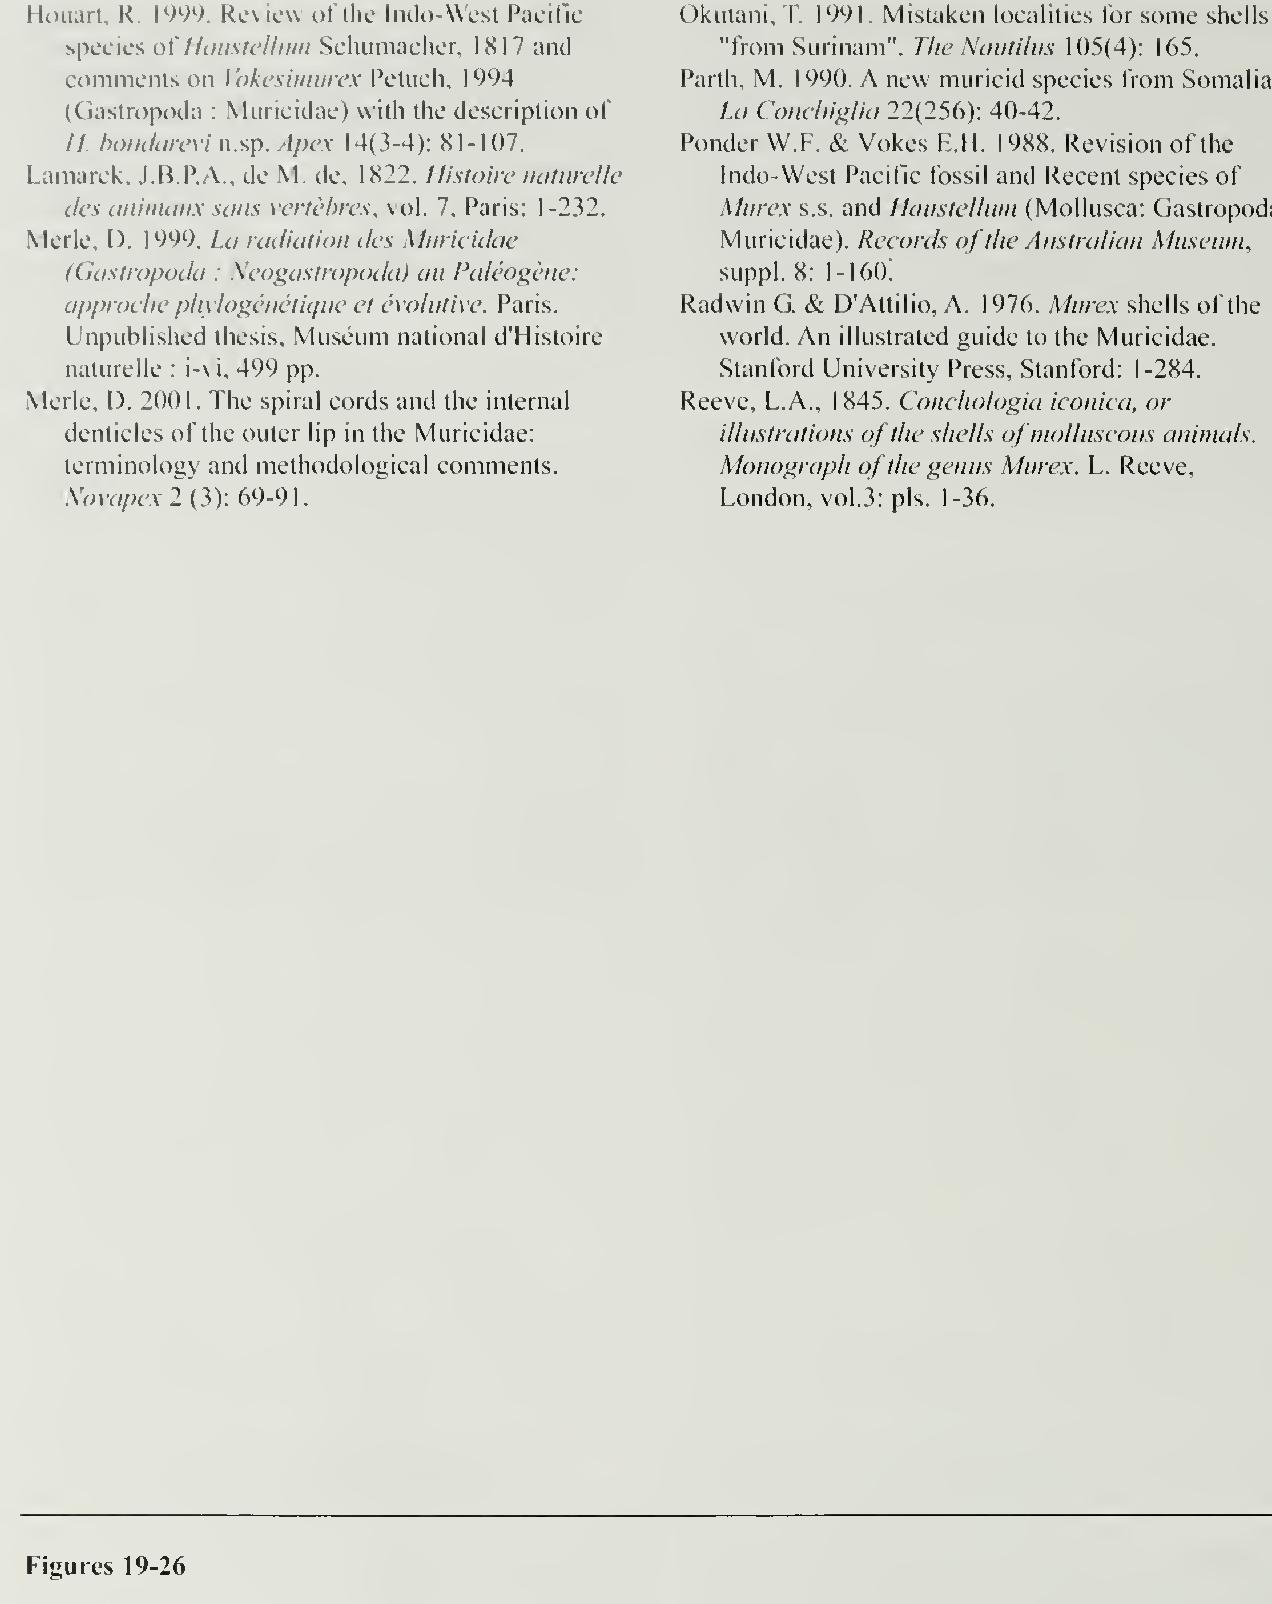 figure 19-26